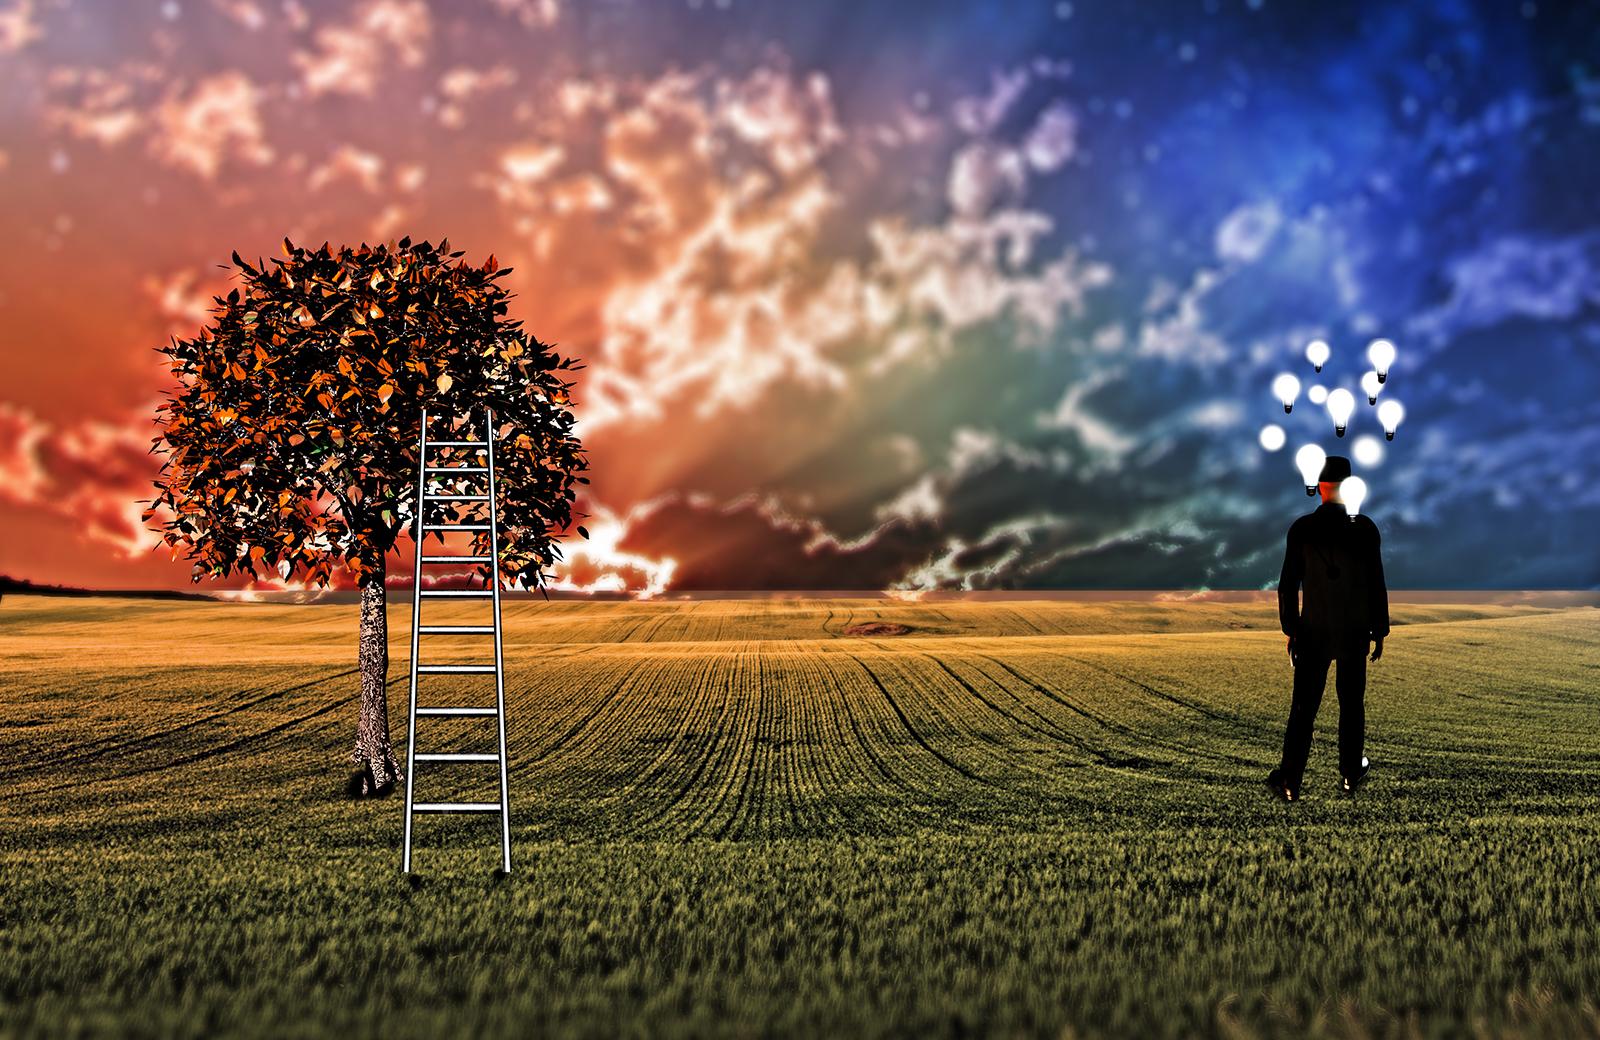 Foto: © rolffimages / Adobe Stock, man in veld met trap tegen boom